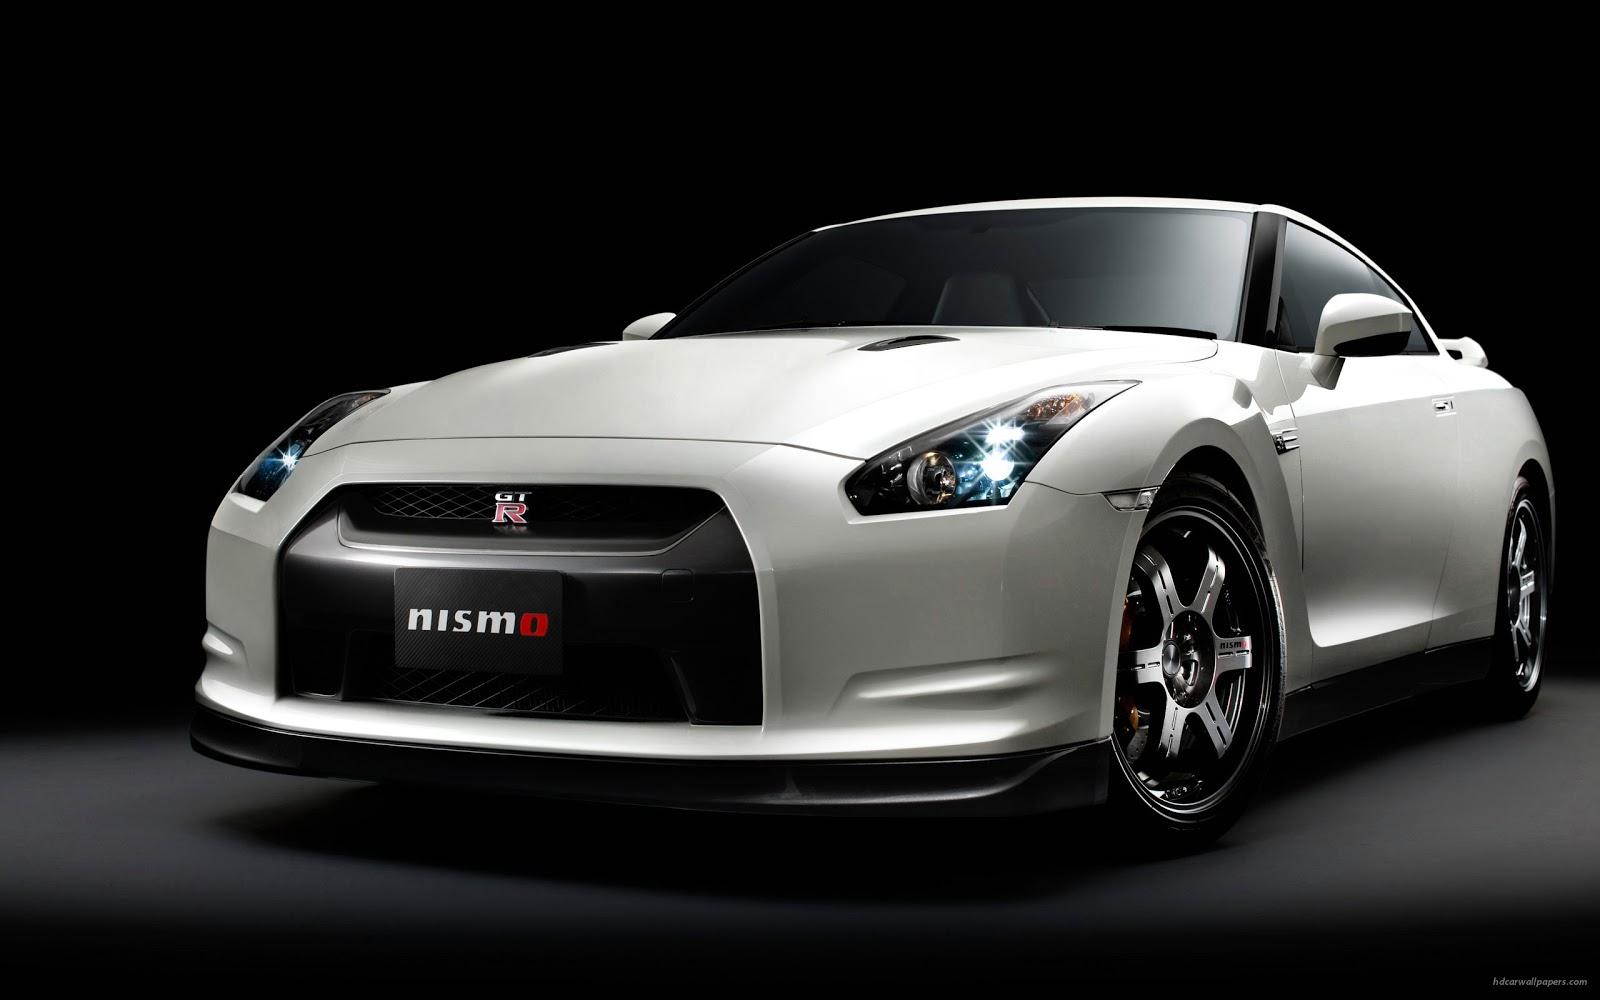 Nissan gtr wallpaper hd  1 World Of Cars 1600x1000